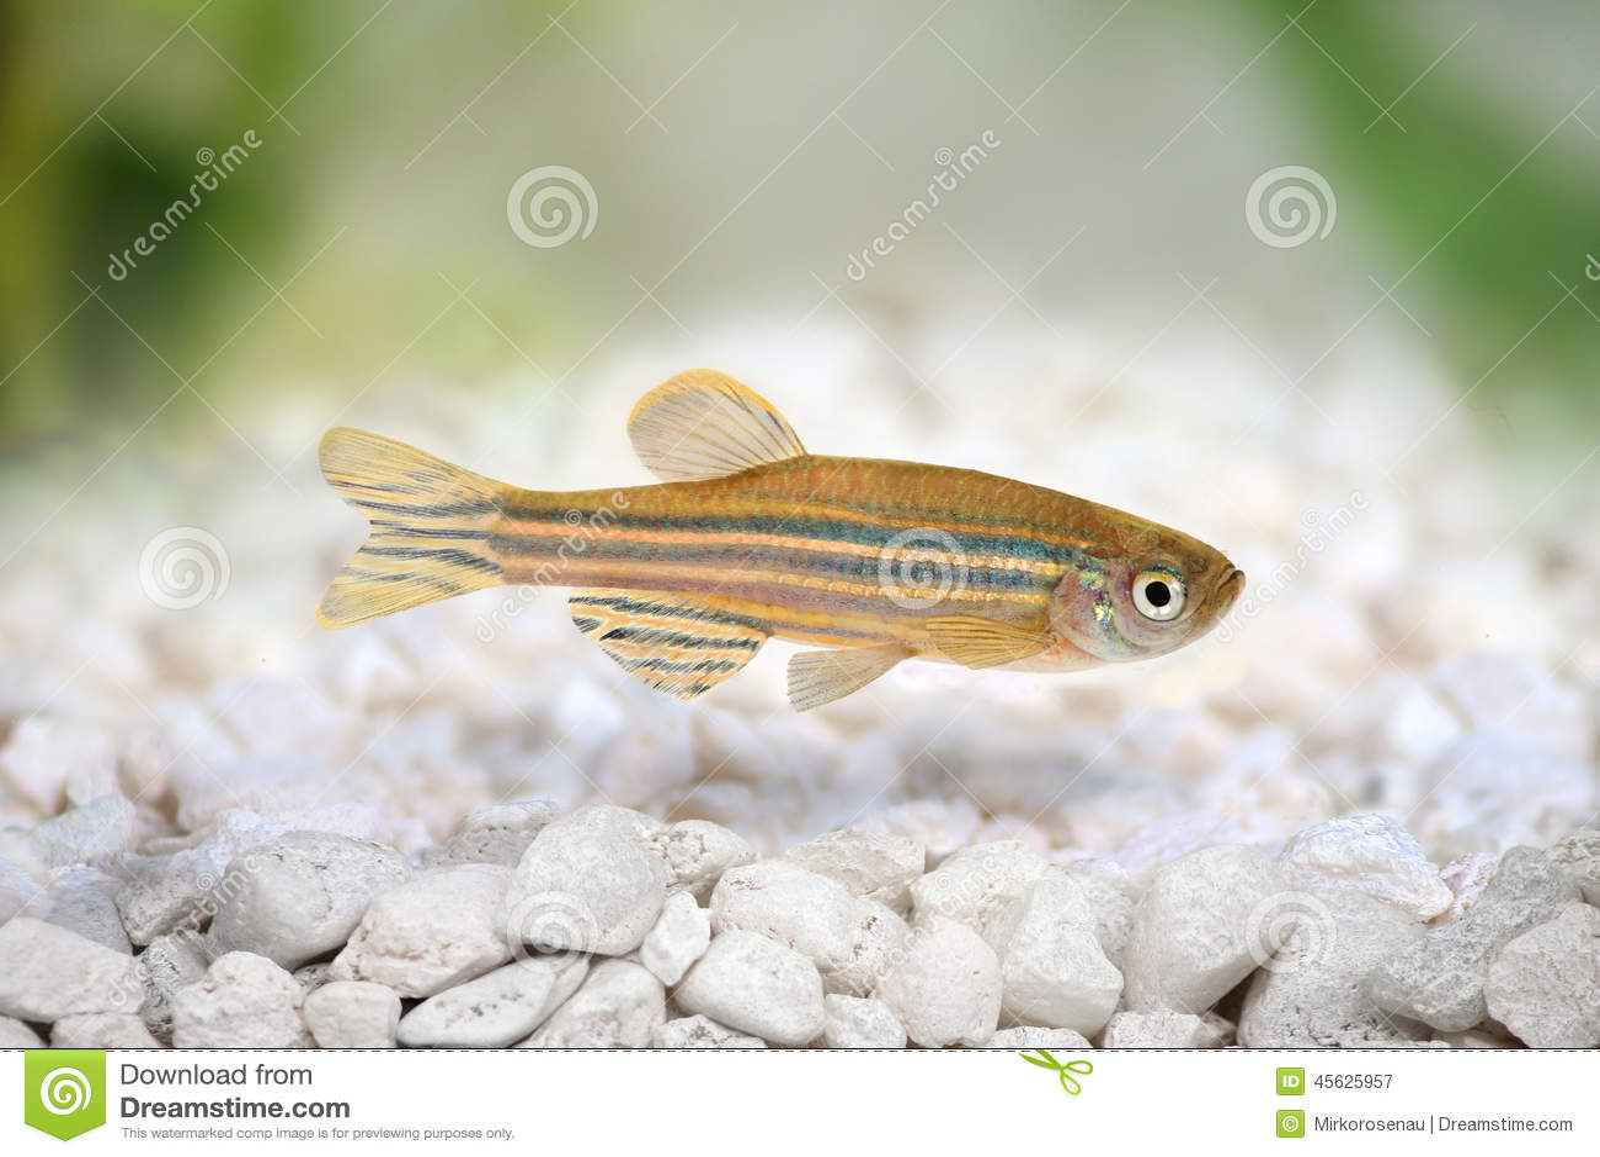 Zebrafish Zebra Barb Danio rerio